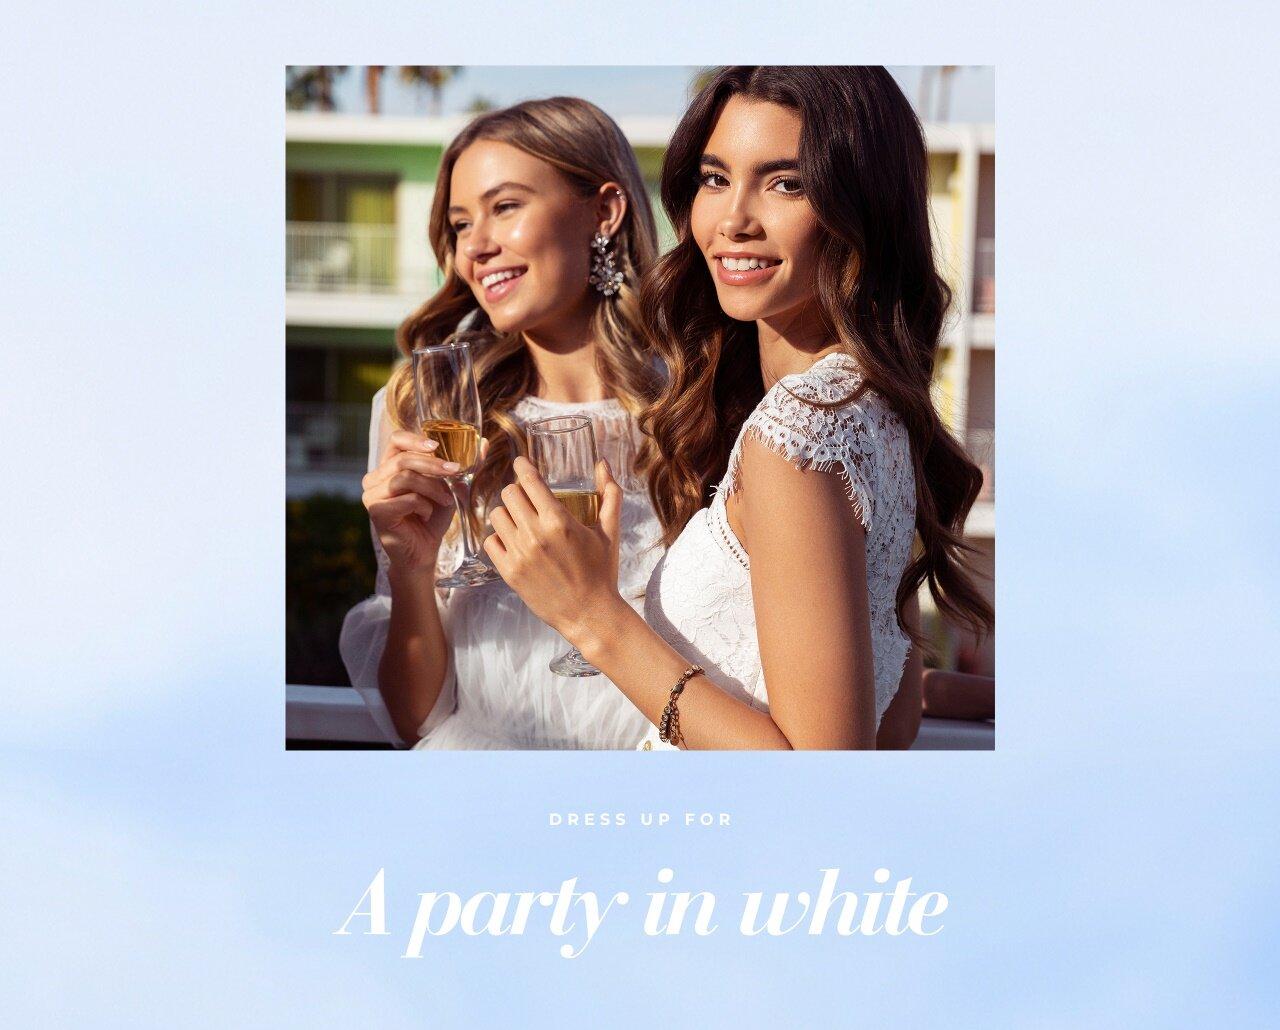 Dress up for a party in white - Osta täältä